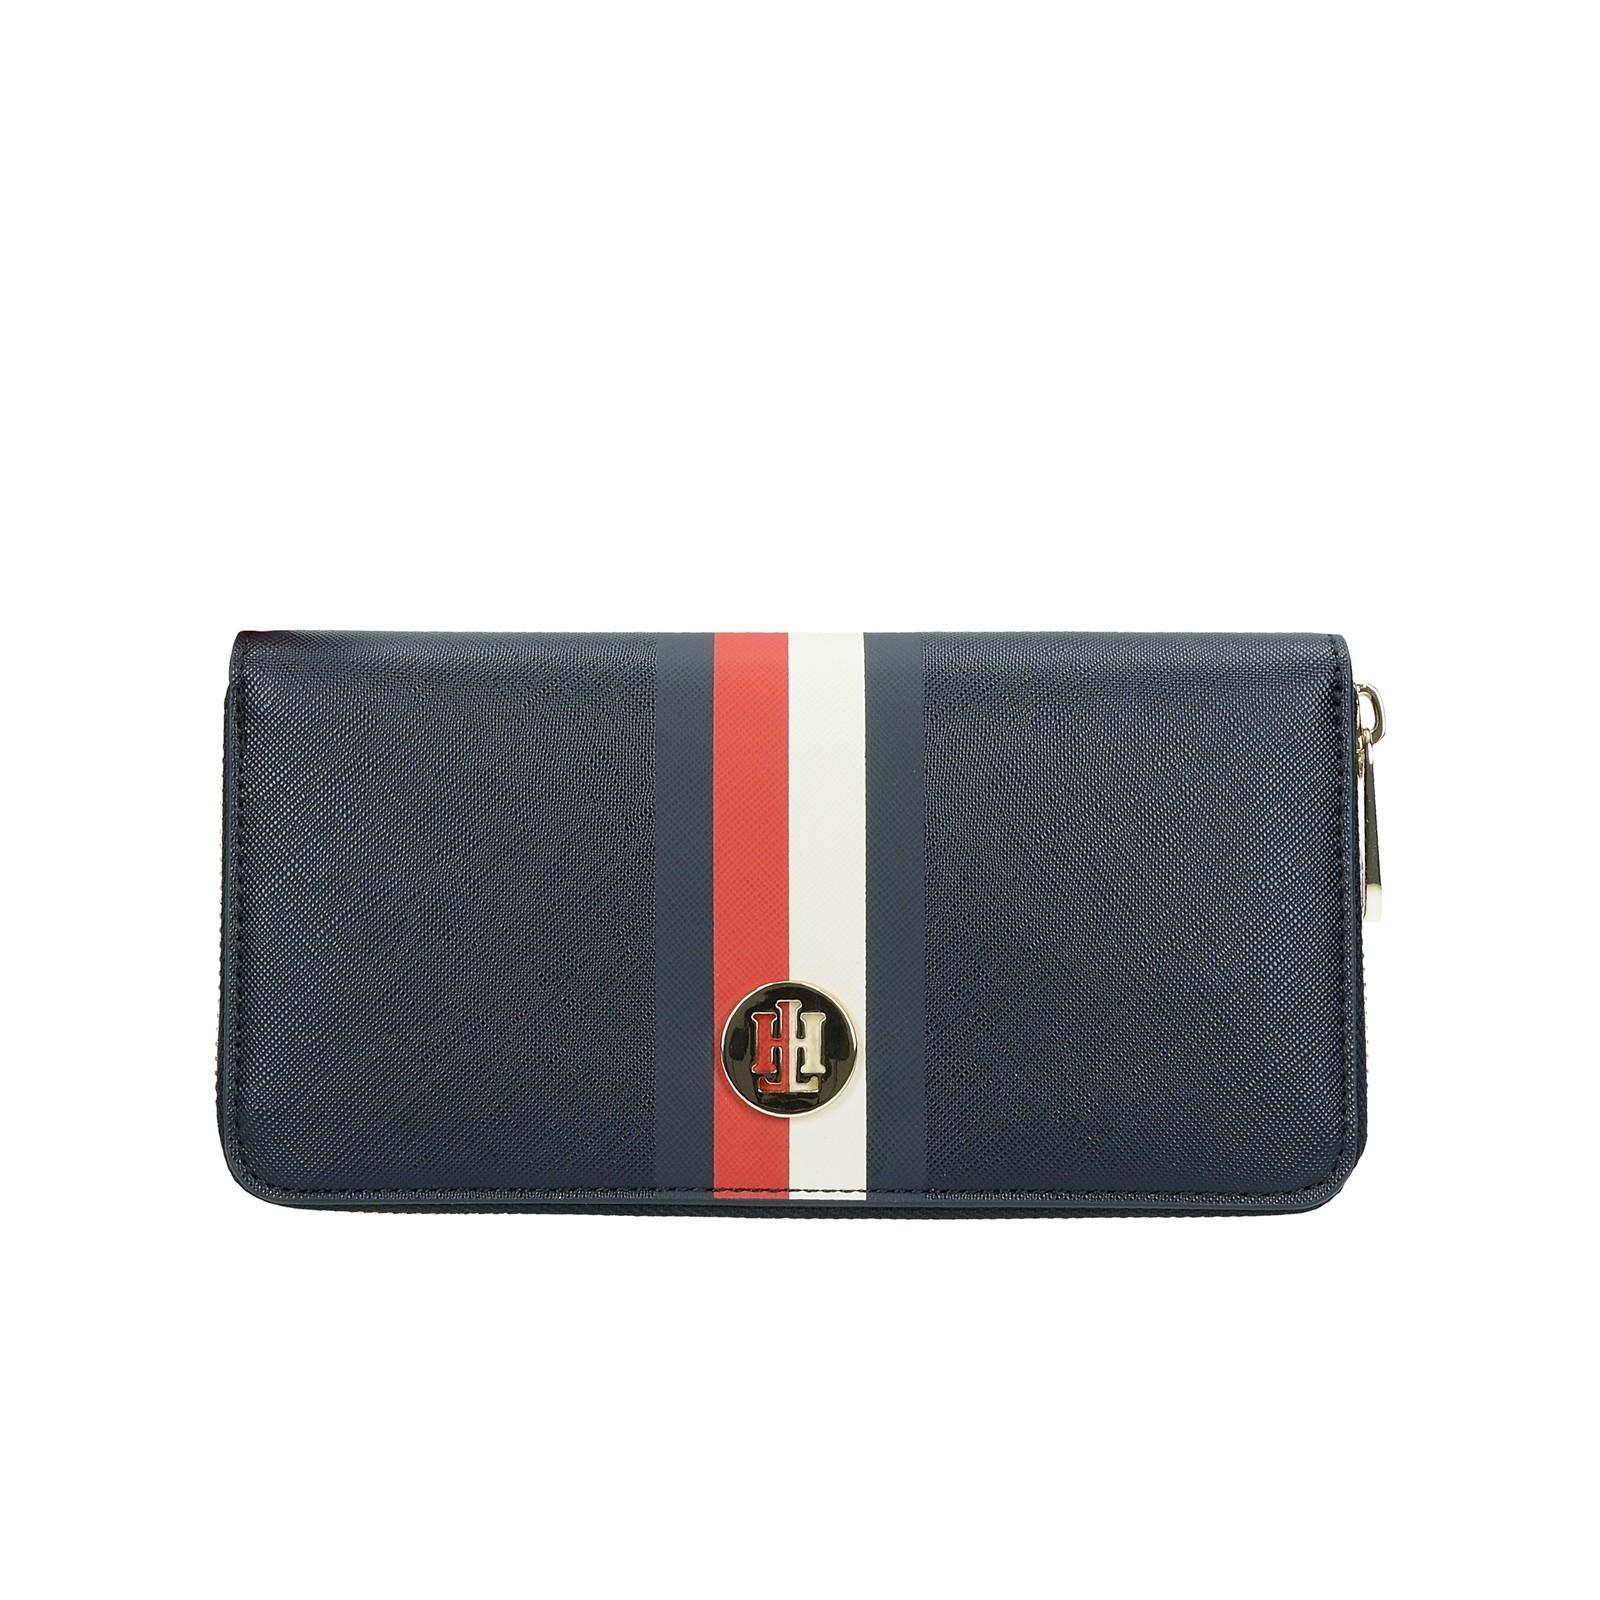 Tommy Hilfiger dámska štýlová peňaženka - tmavomodrá